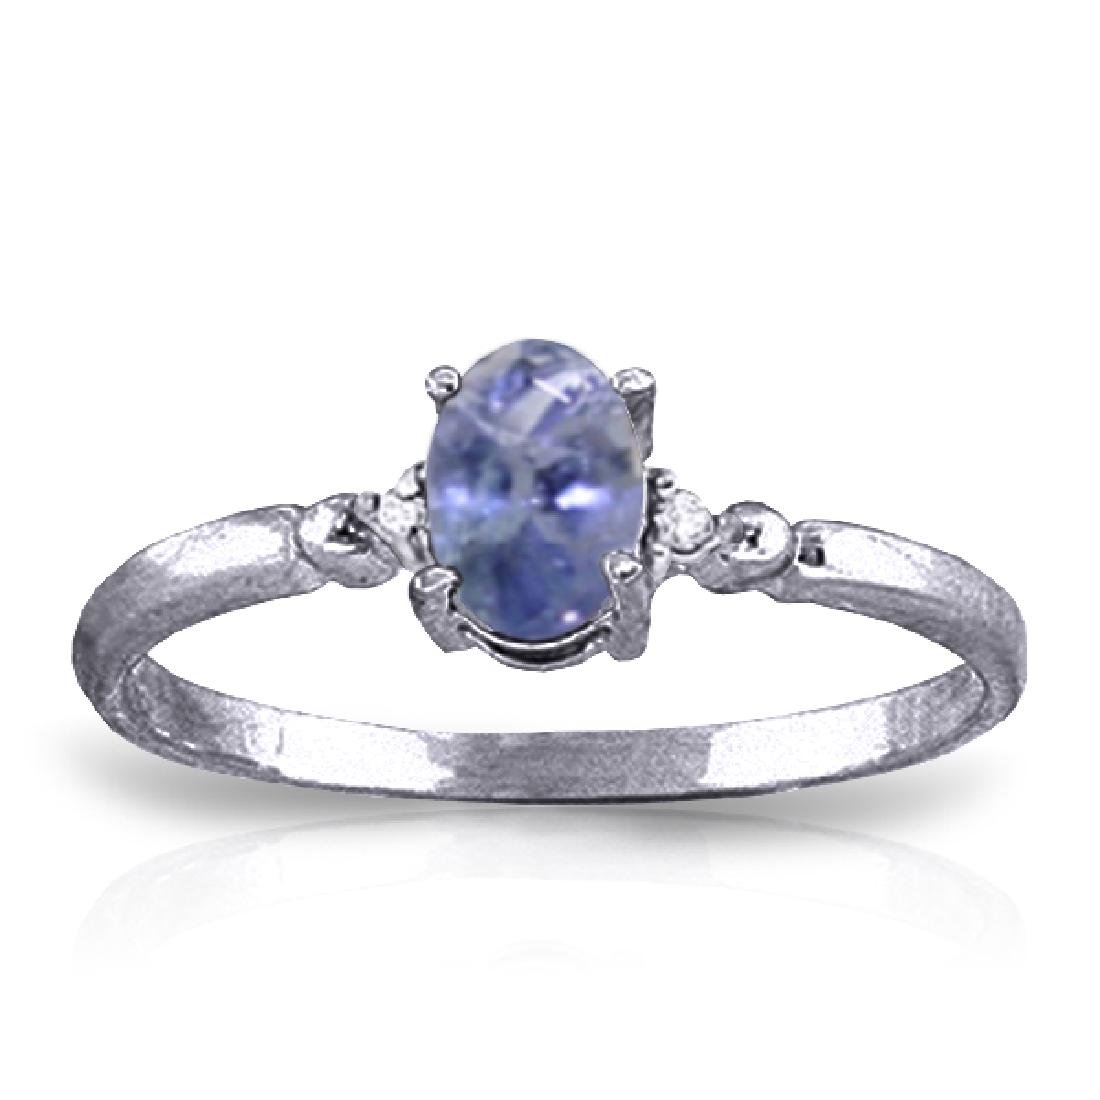 Genuine 0.46 ctw Tanzanite & Diamond Ring Jewelry 14KT